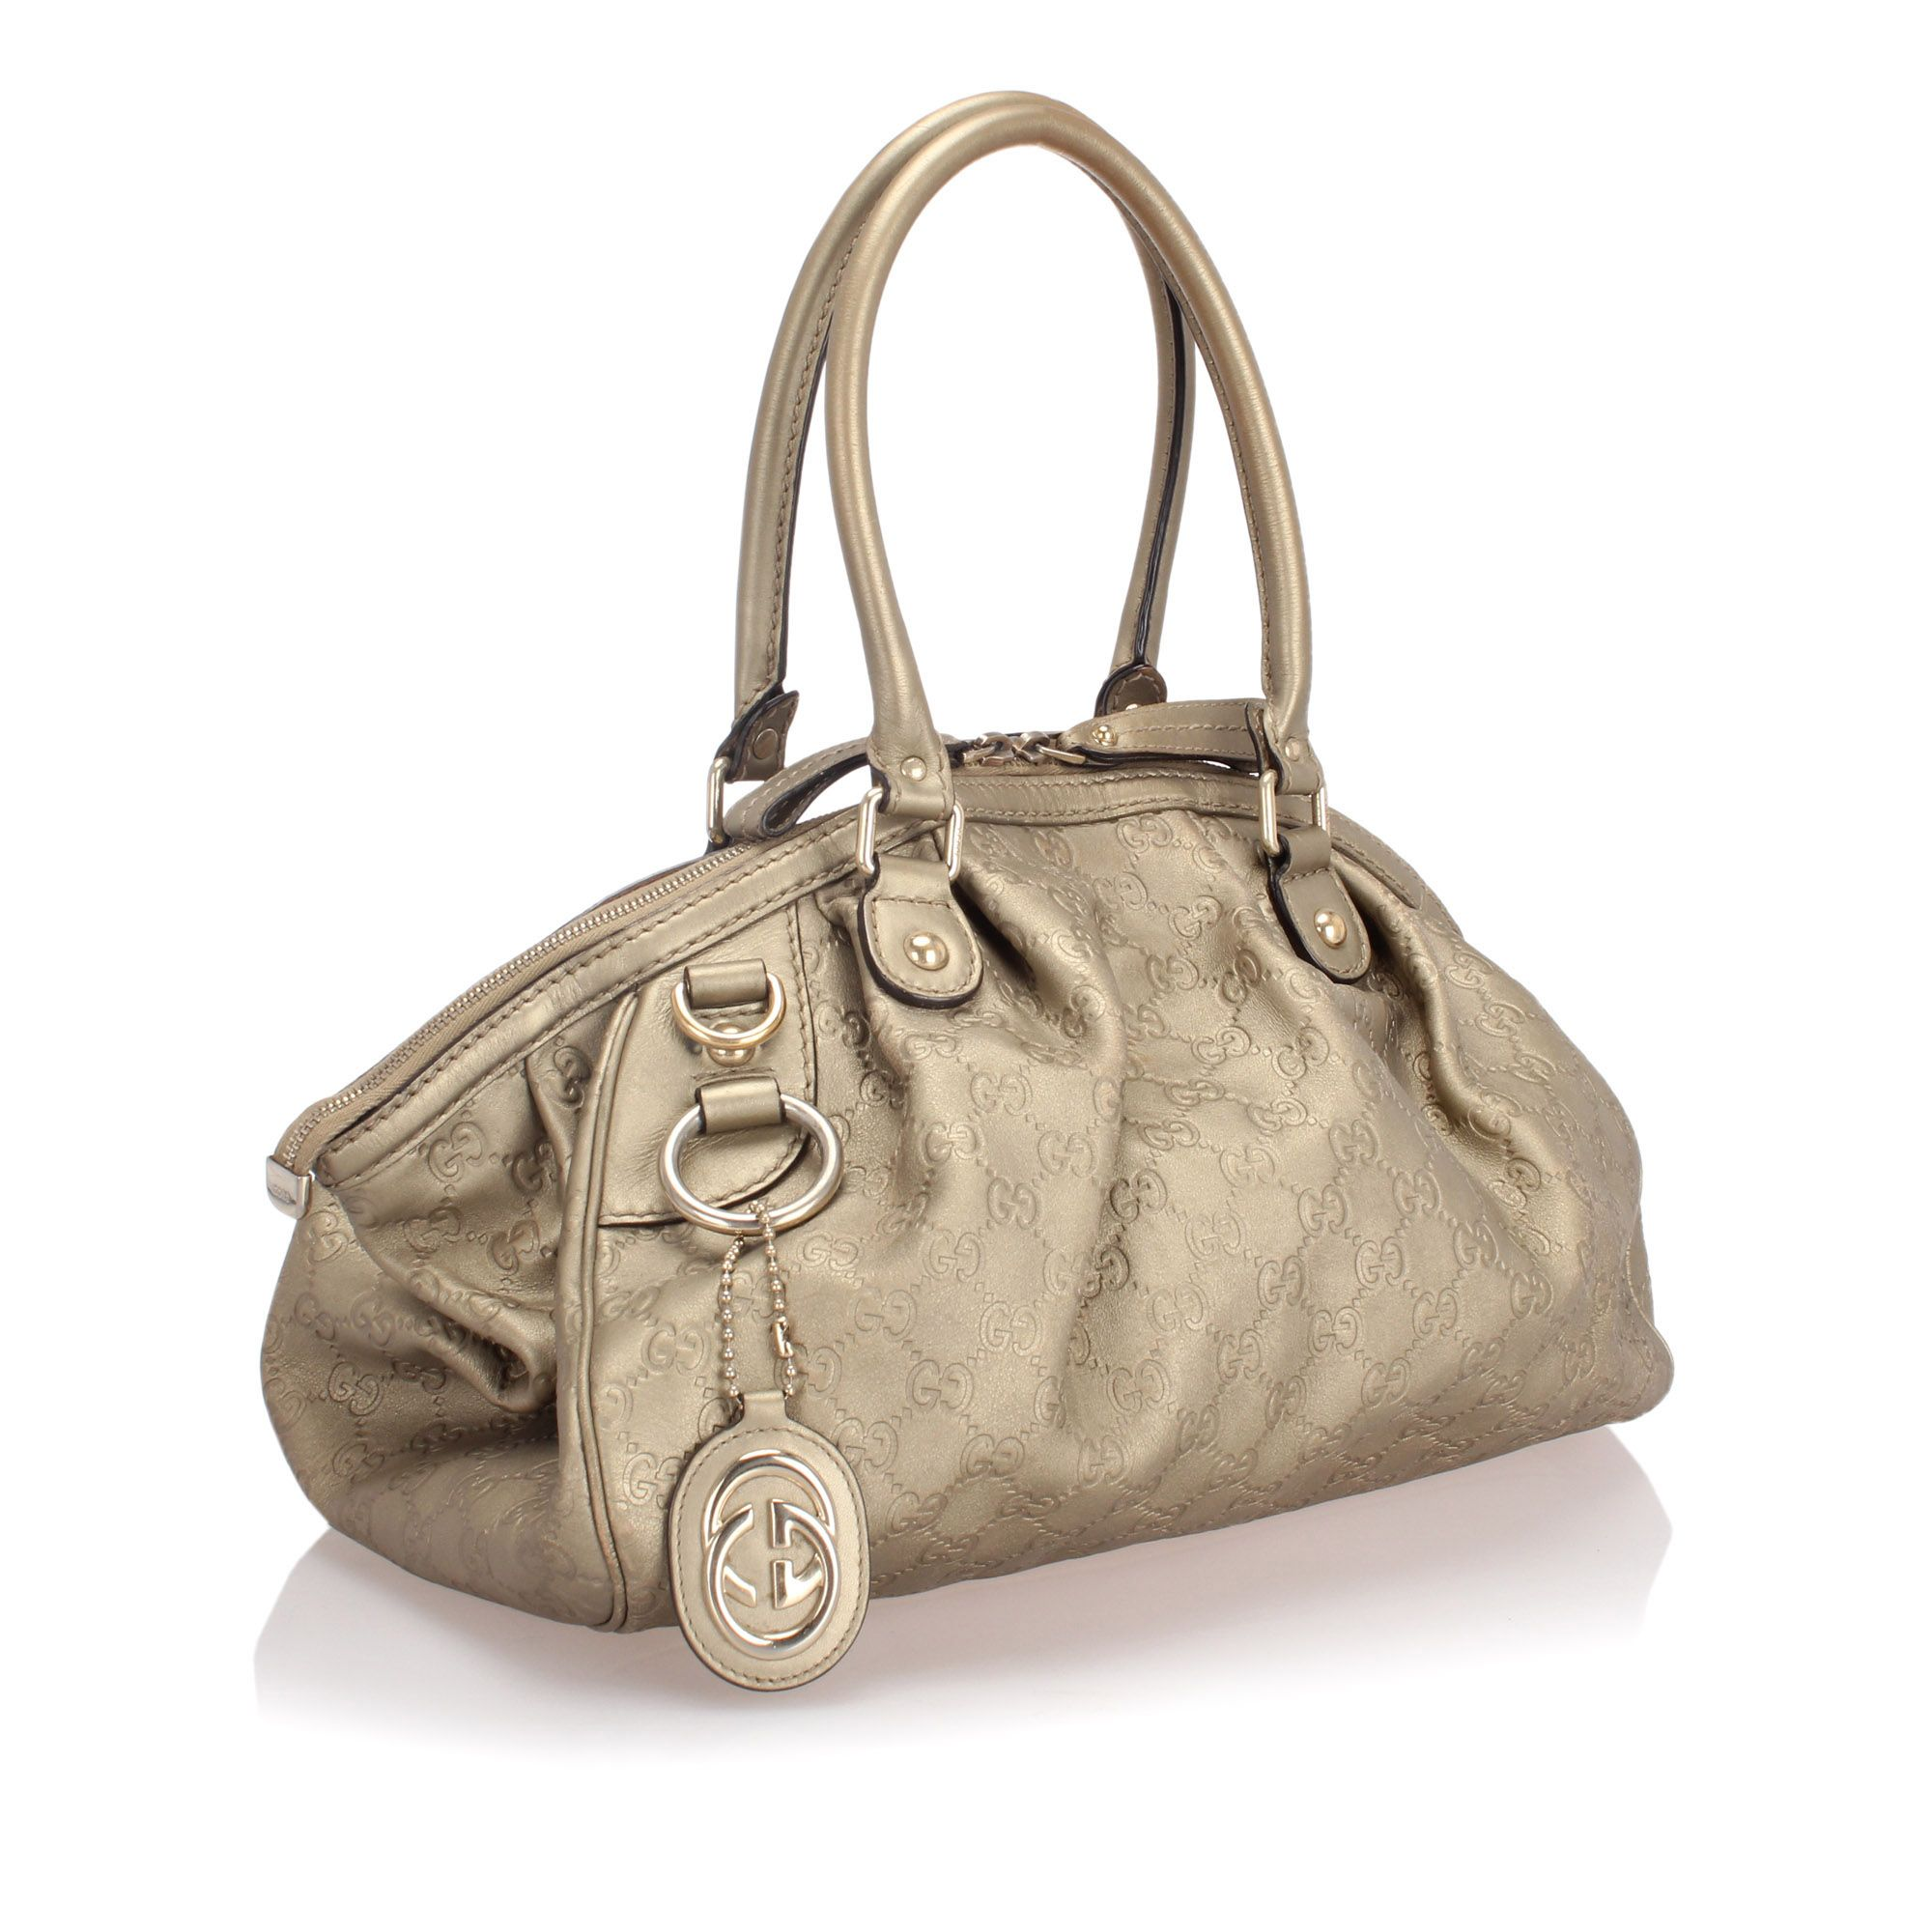 Vintage Gucci Guccissima Sukey Satchel Gold